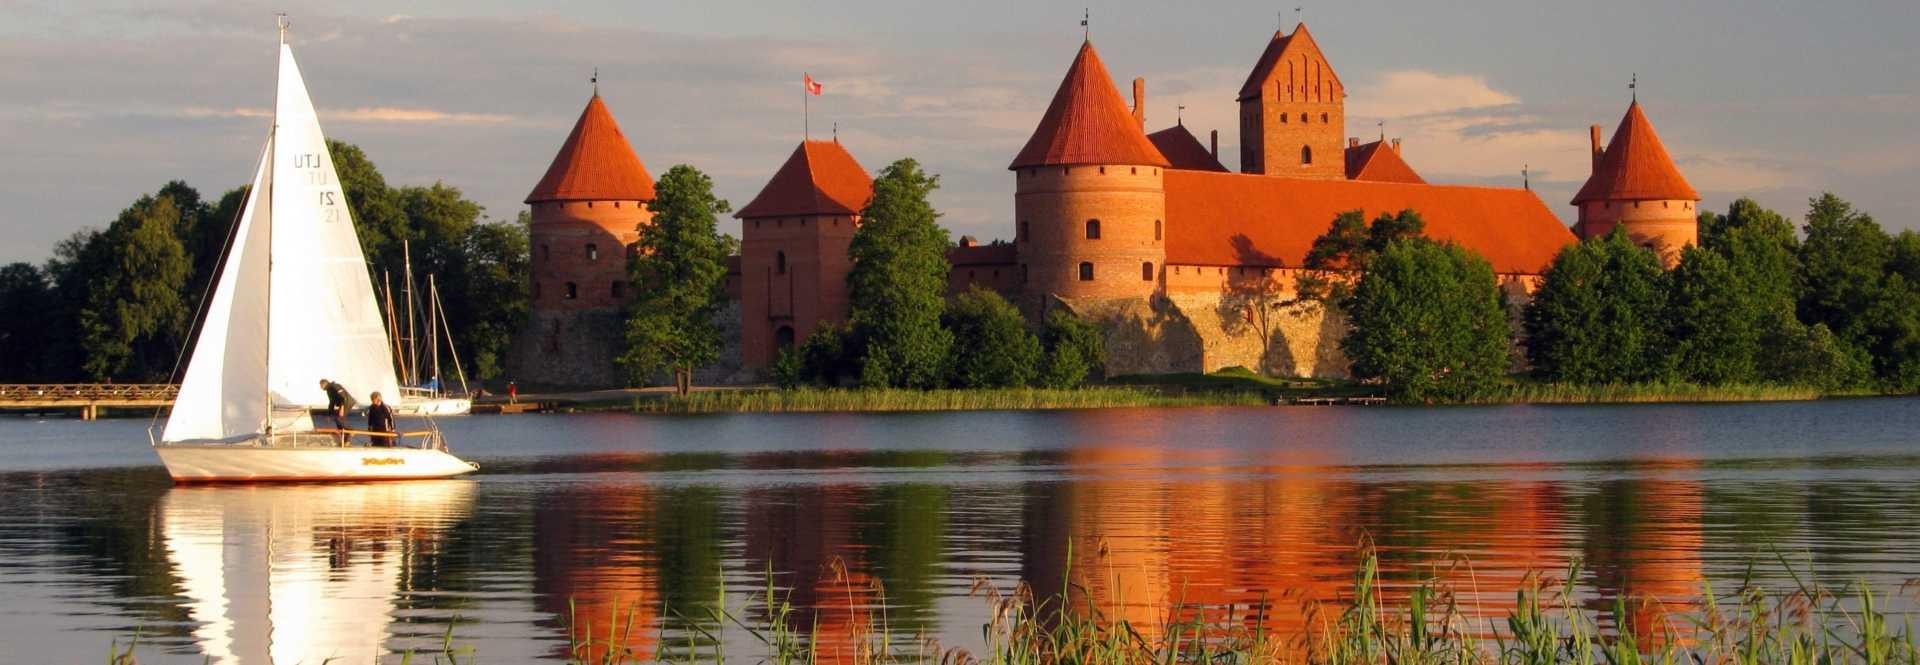 Trakai castle Lithuania لیتوانی